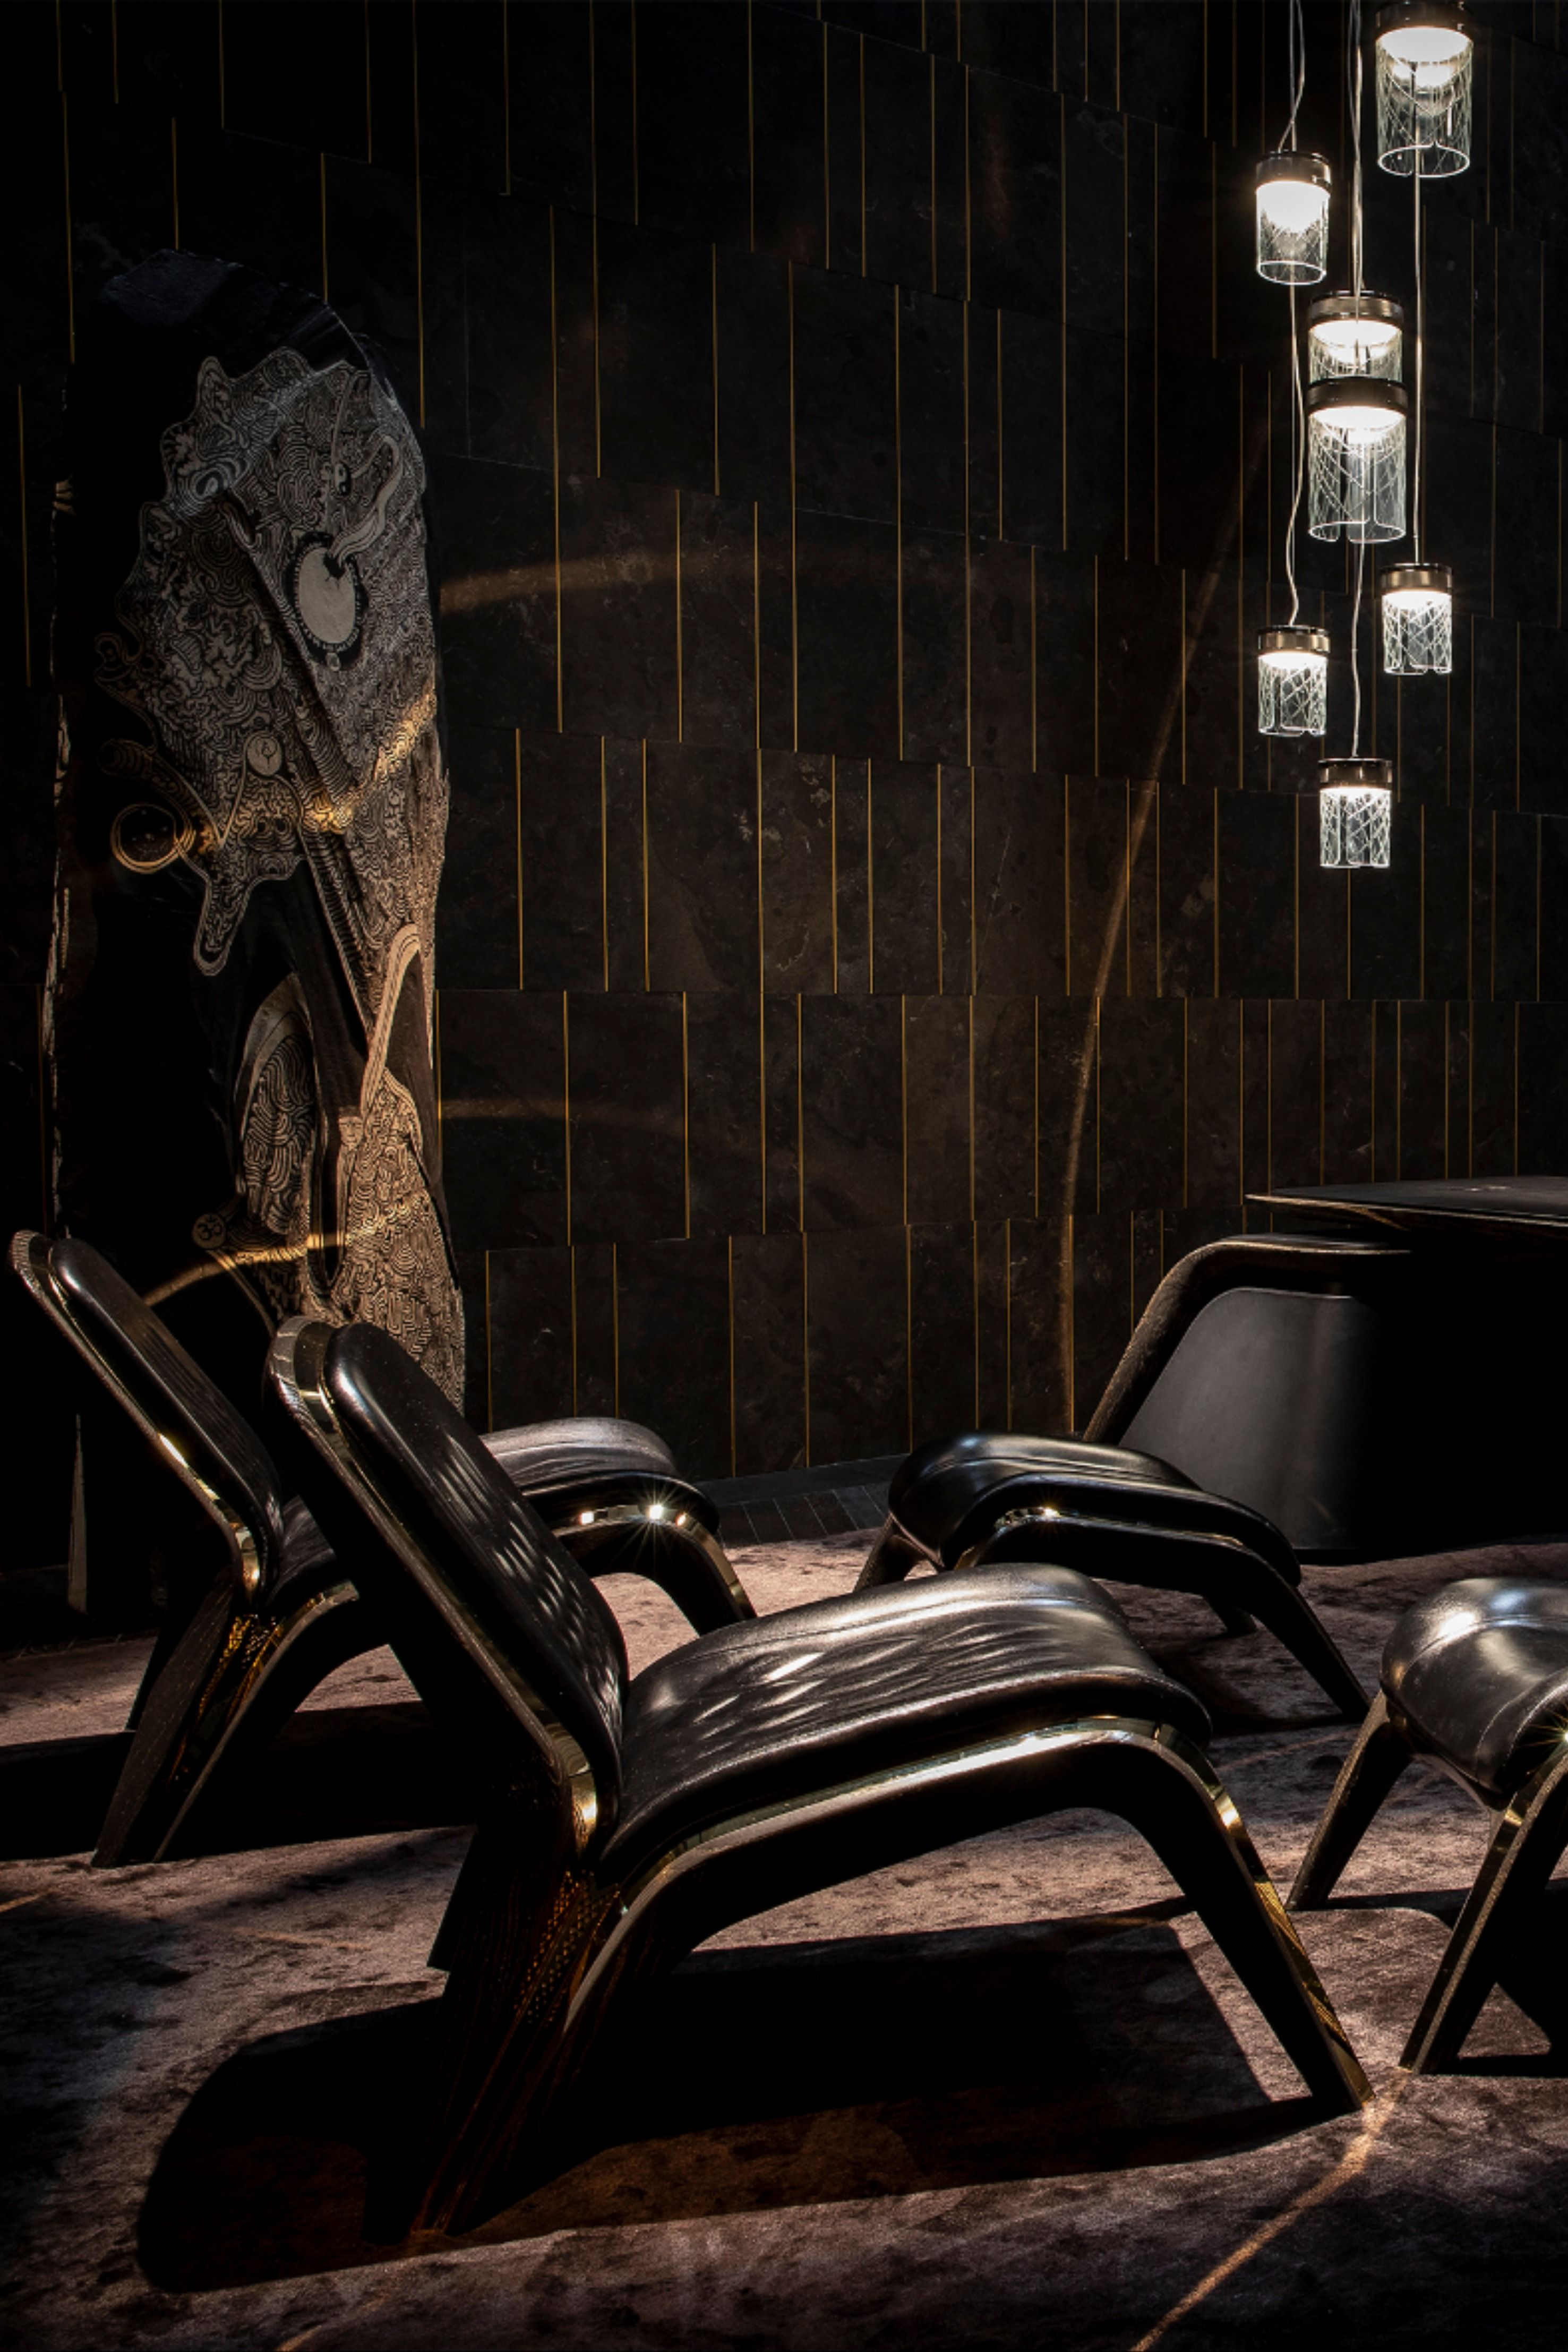 #armchair #footstool #Bentley #luxuryfurniture #luxurylivinggroup